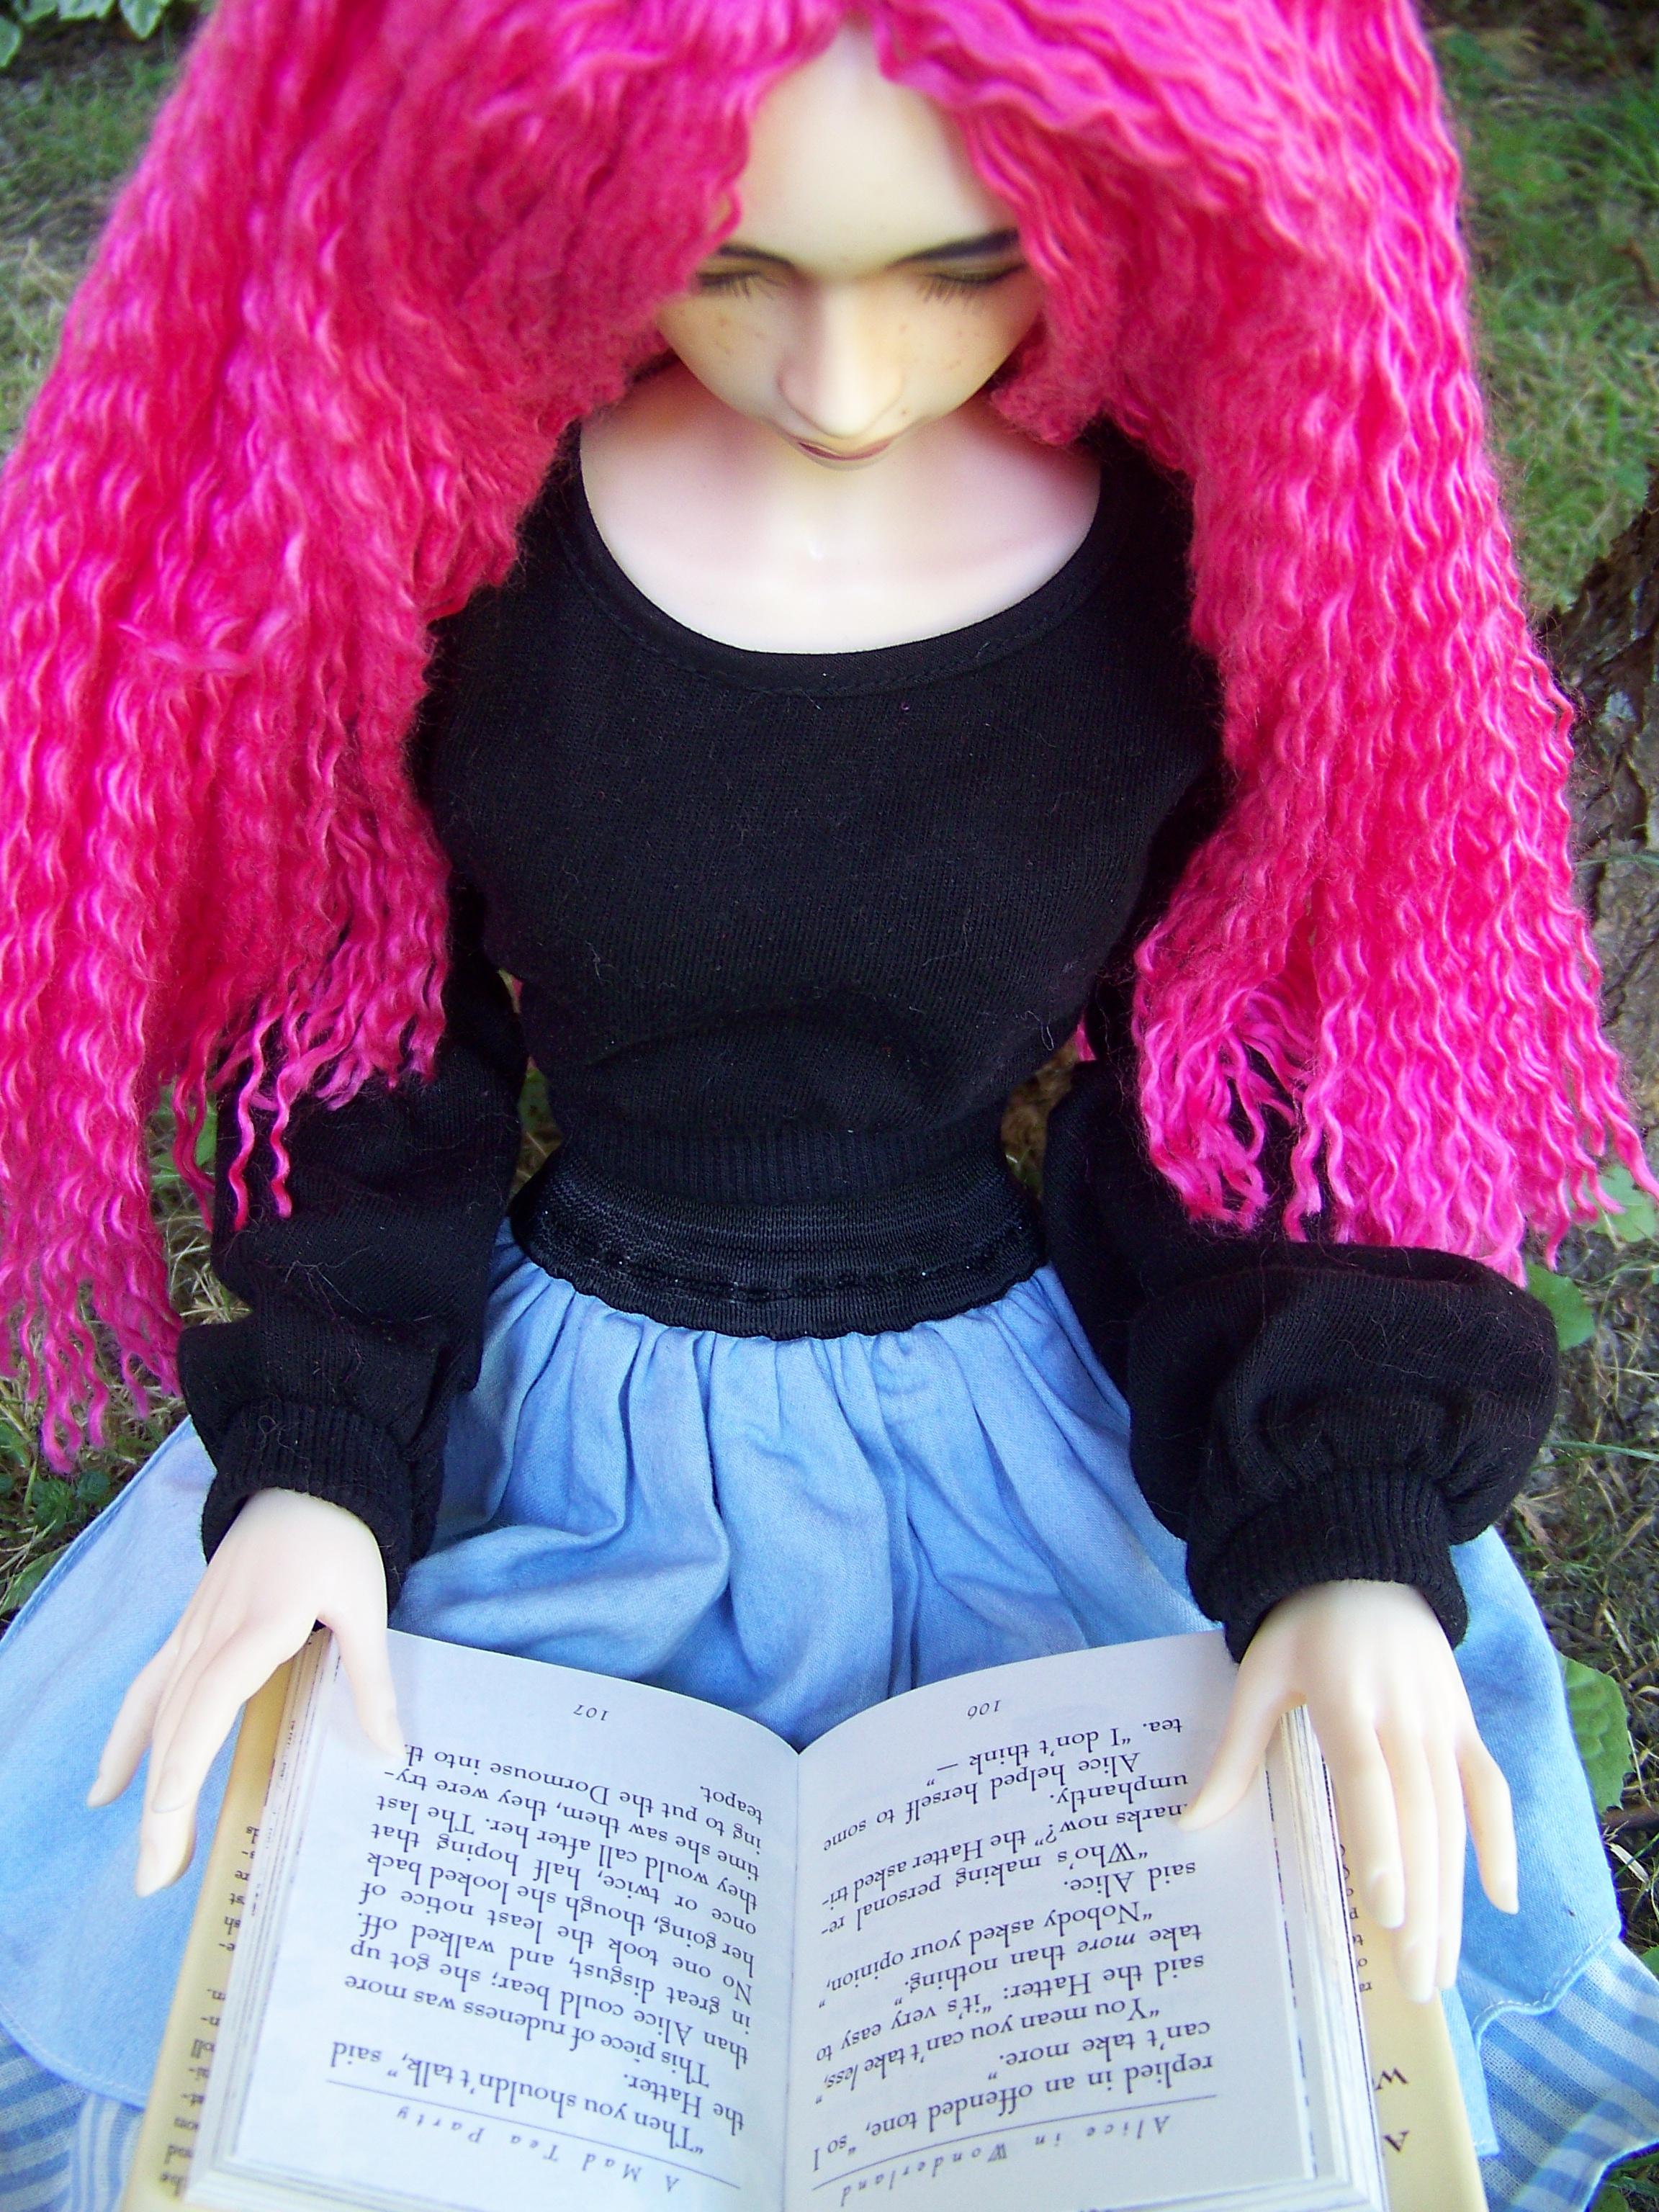 http://www.oddpla.net/blog/dolls/sarah/pretty/100_5785.JPG